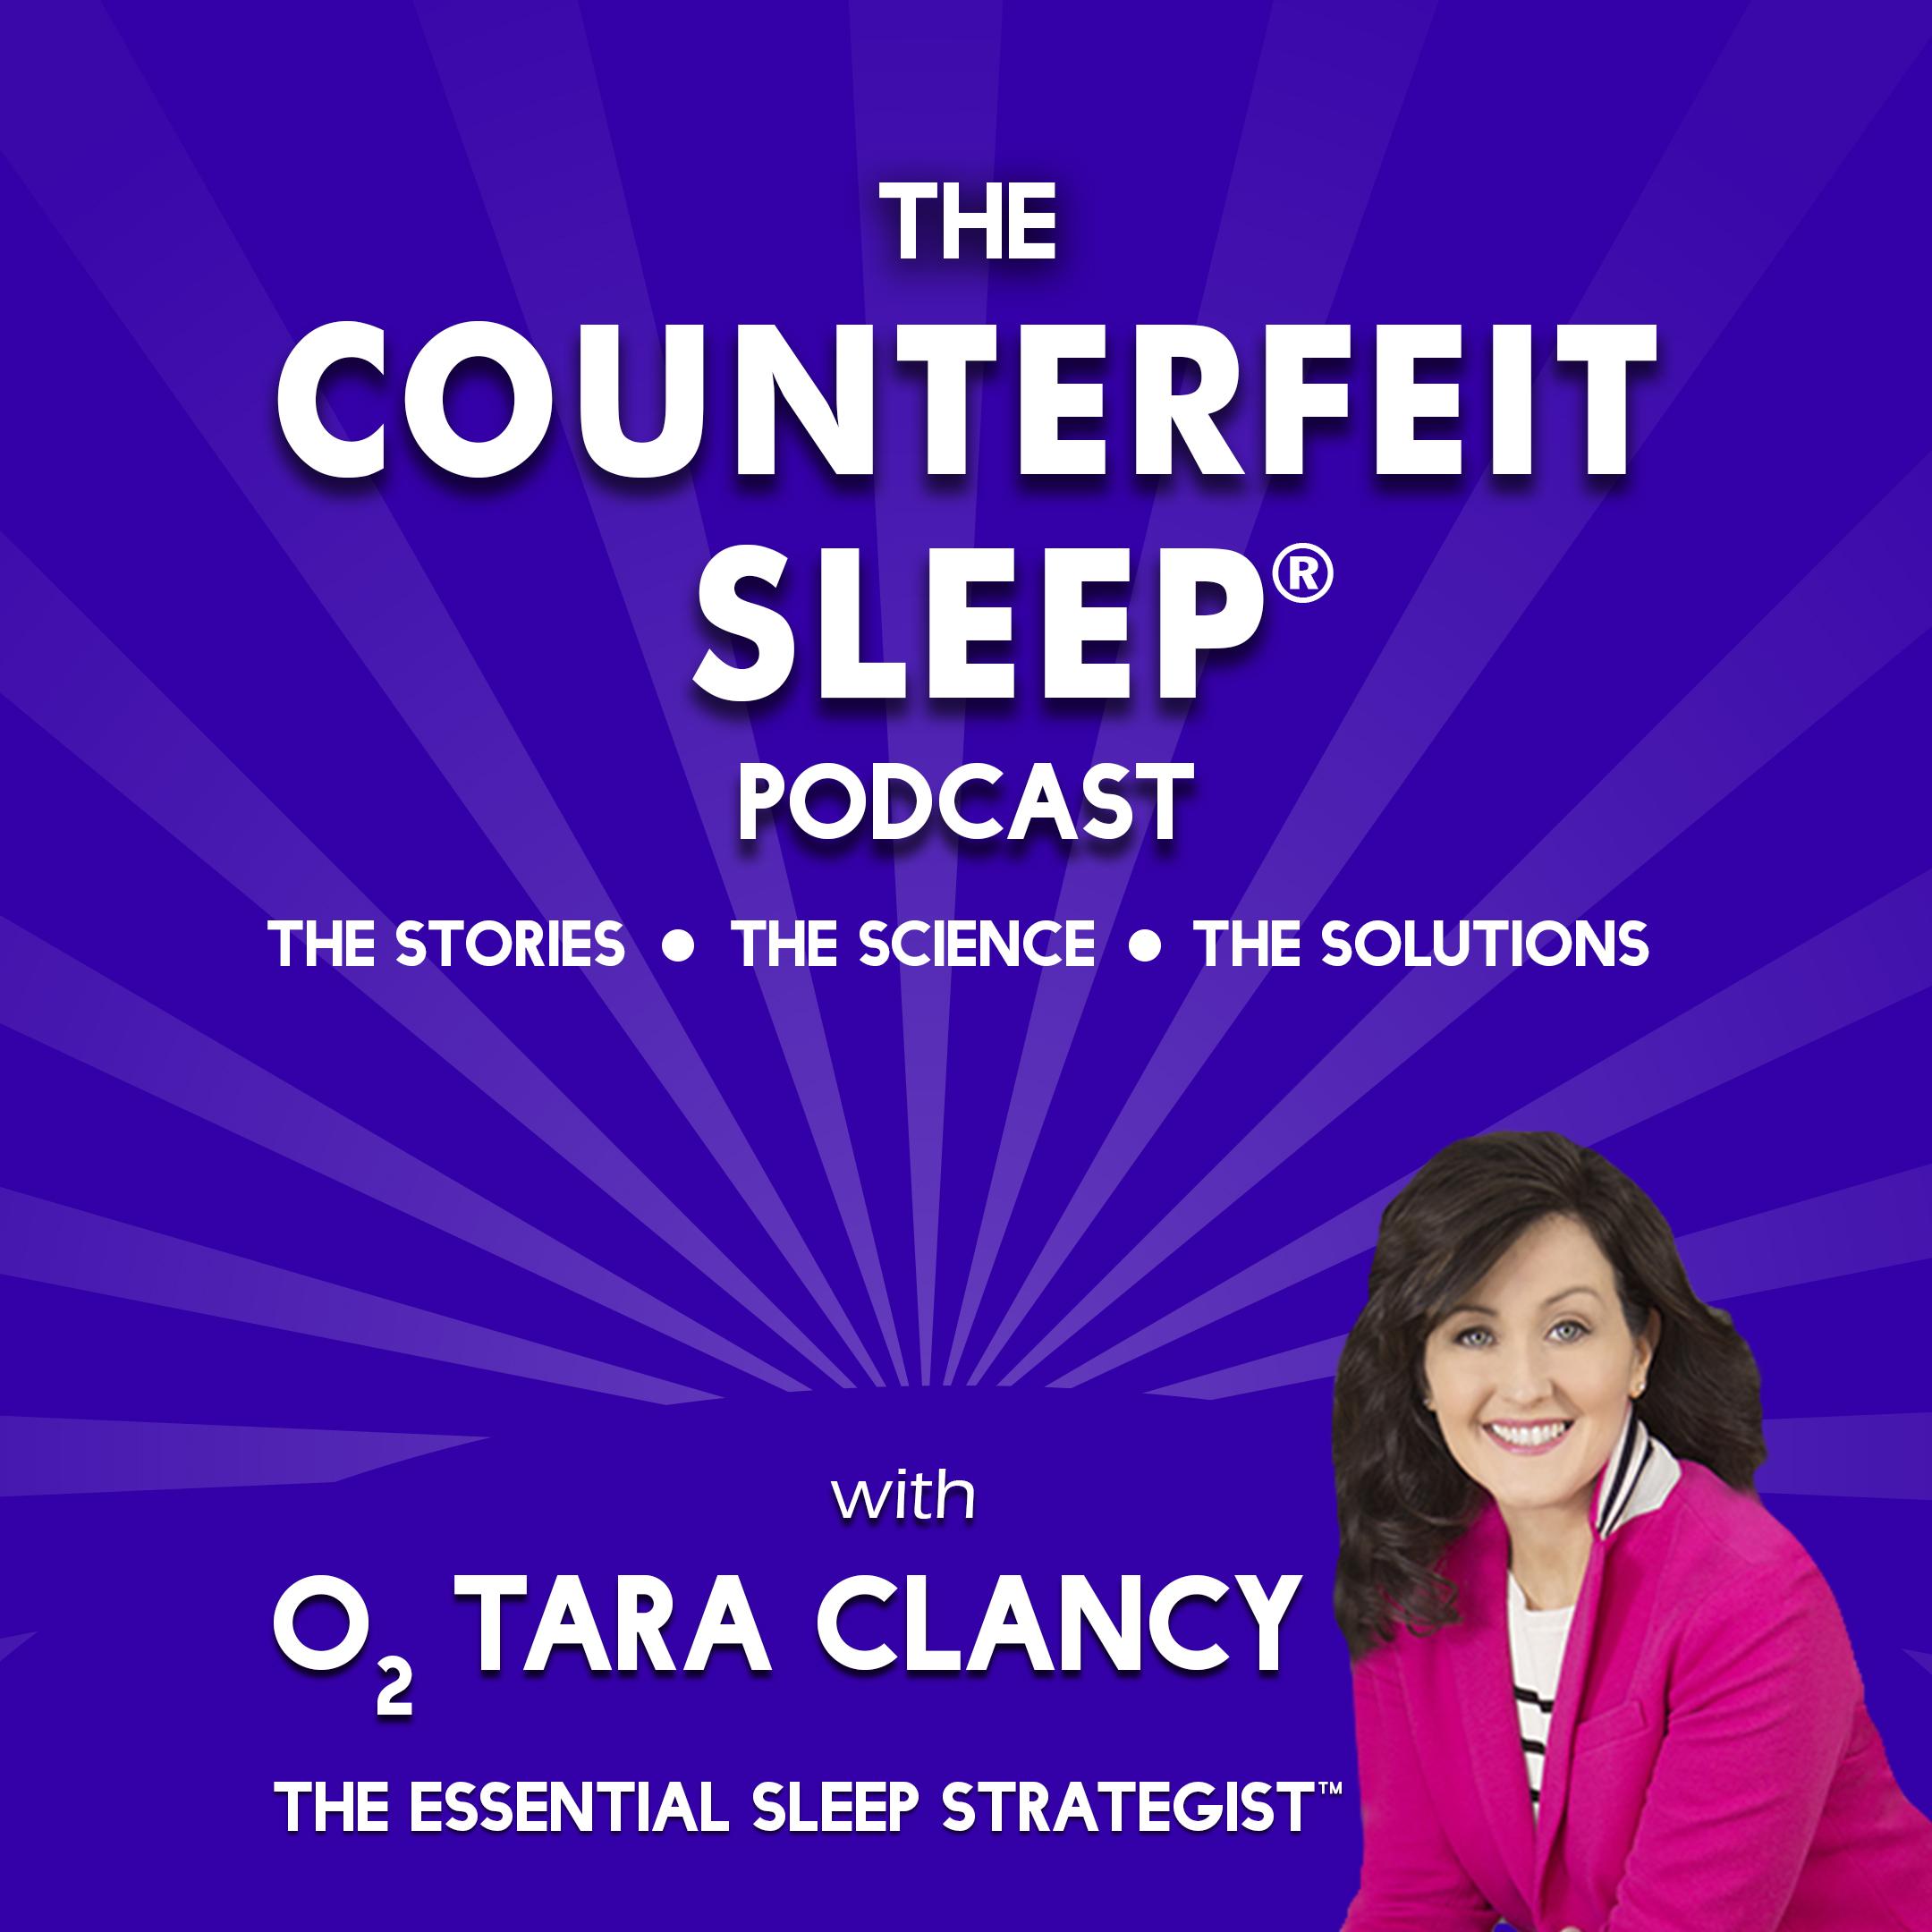 podcast WORLD SLEEP DAY SOCIETY